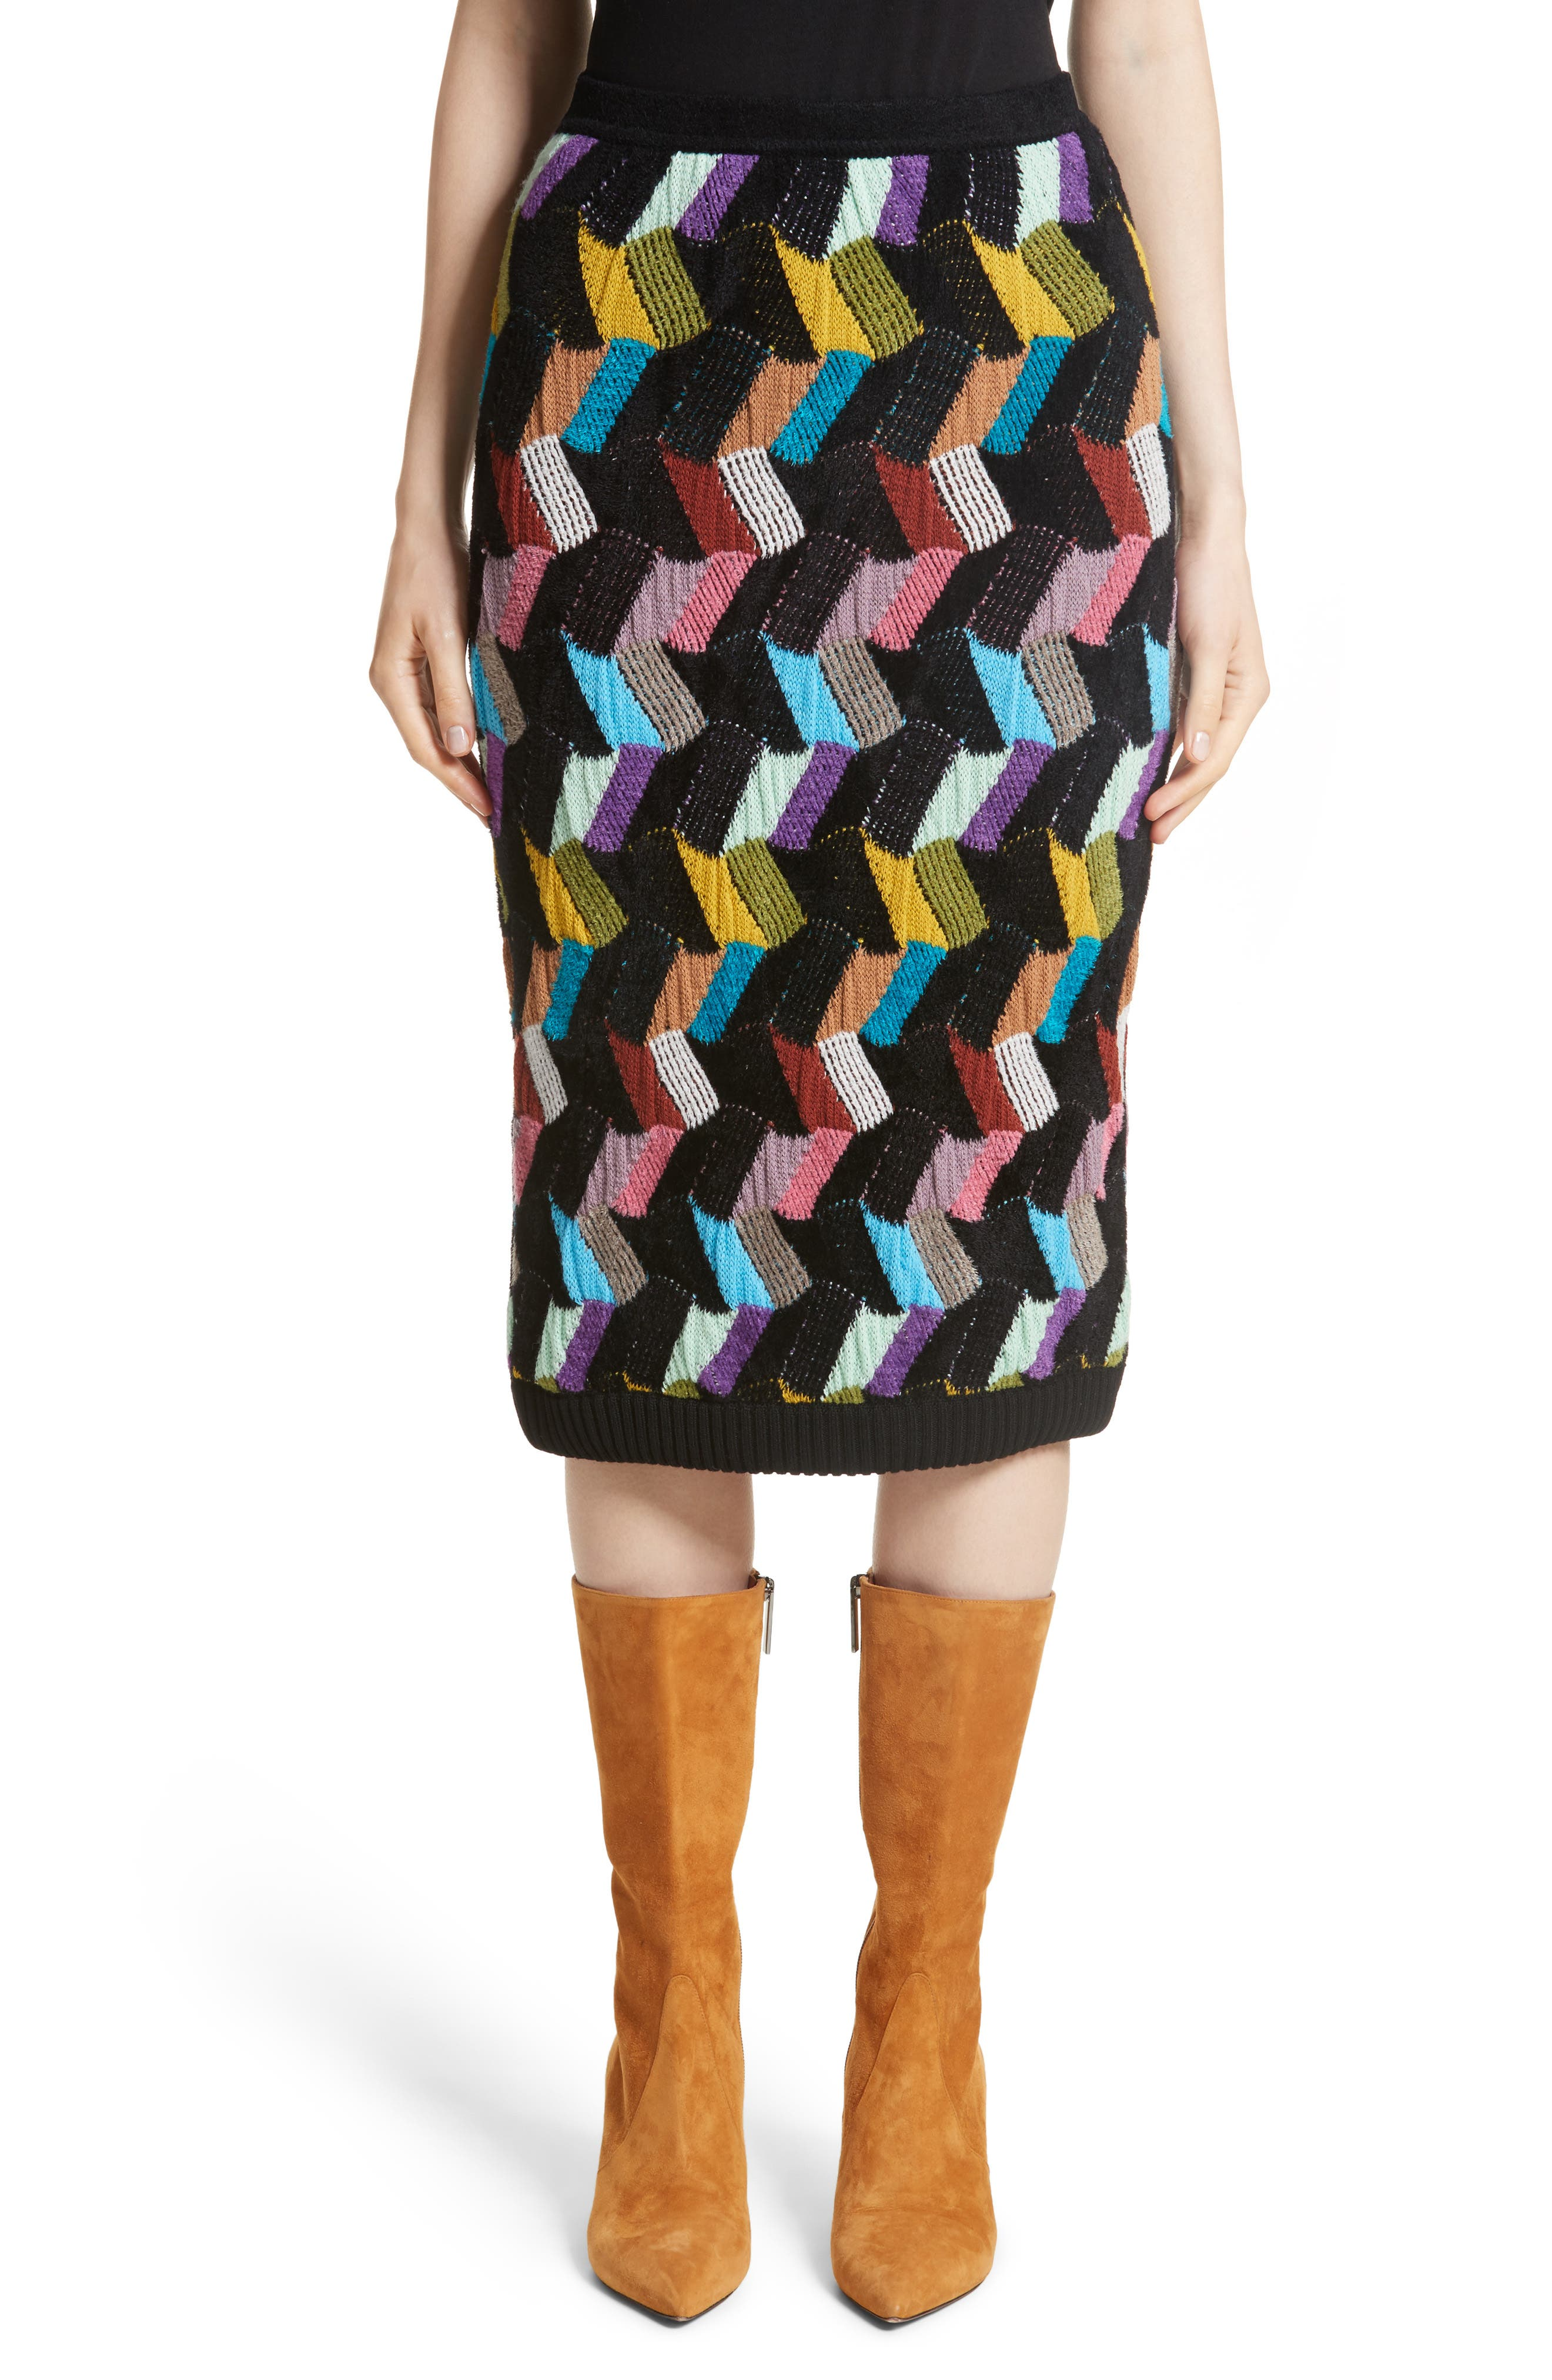 Missoni Multi Knit Pencil Skirt